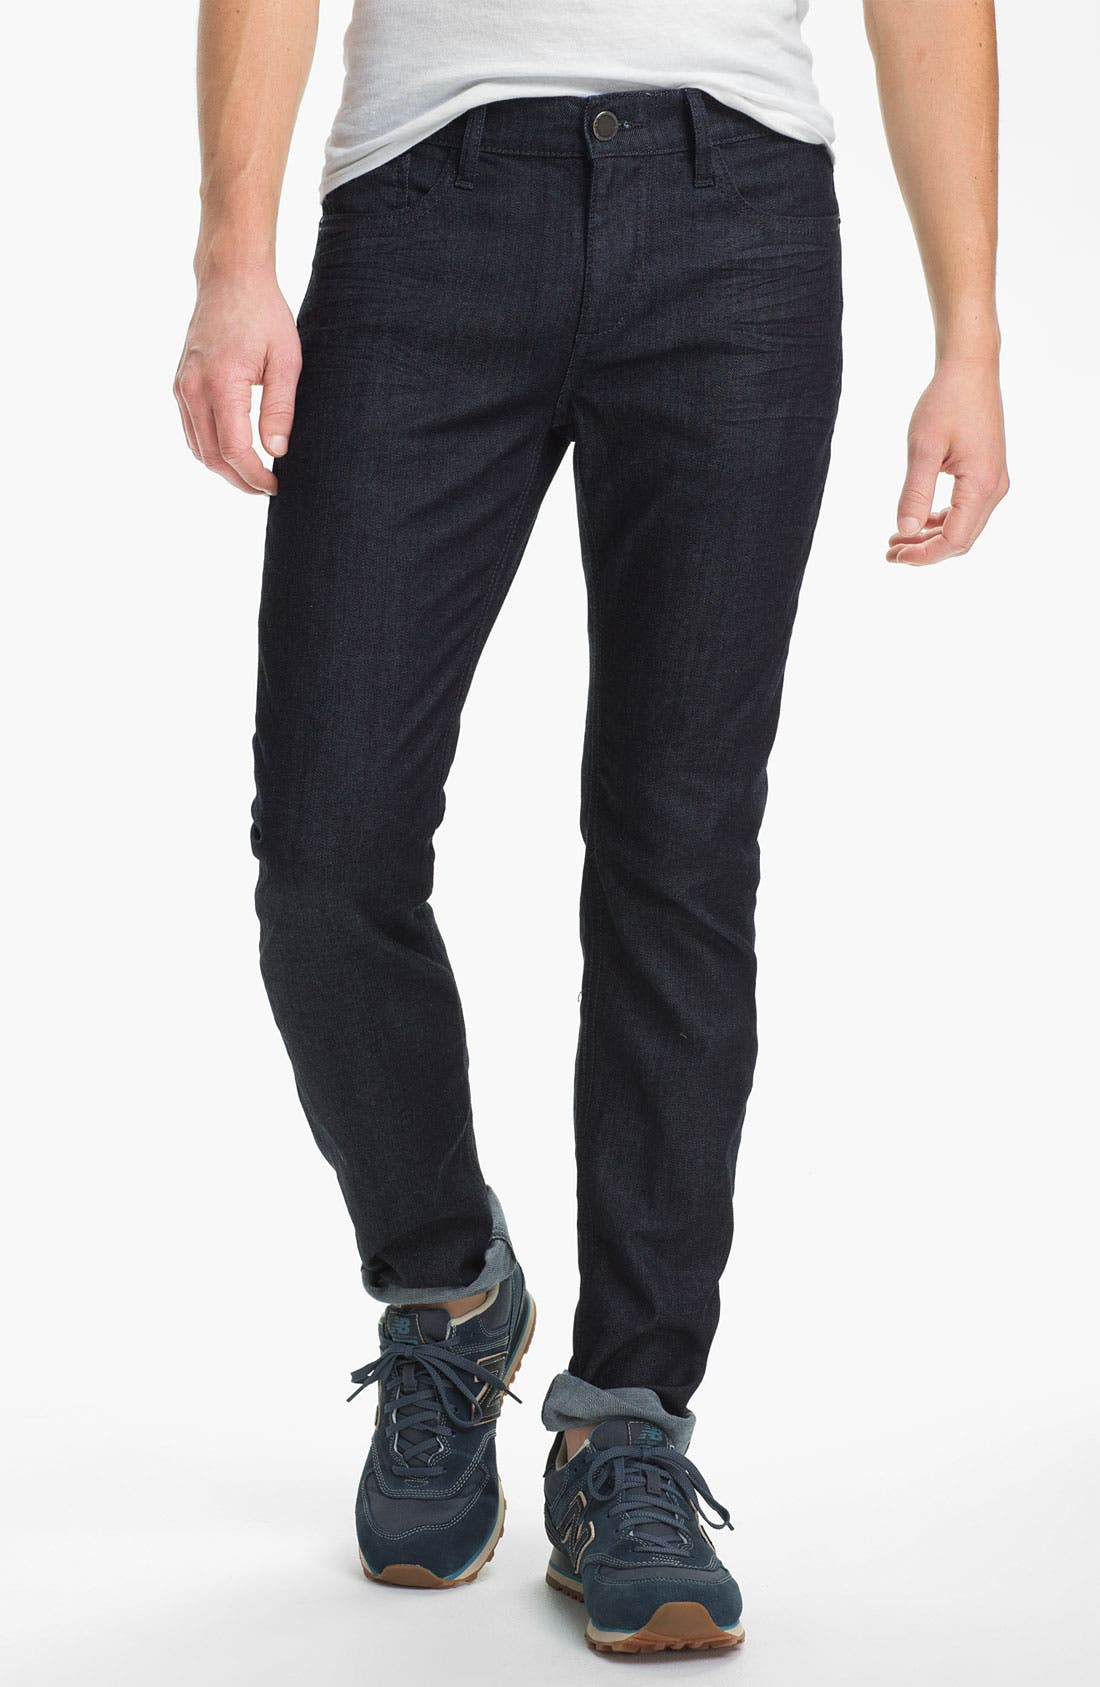 Alternate Image 1 Selected - DL1961 'Nick' Slim Straight Leg Jeans (Sullivan) (Online Only)